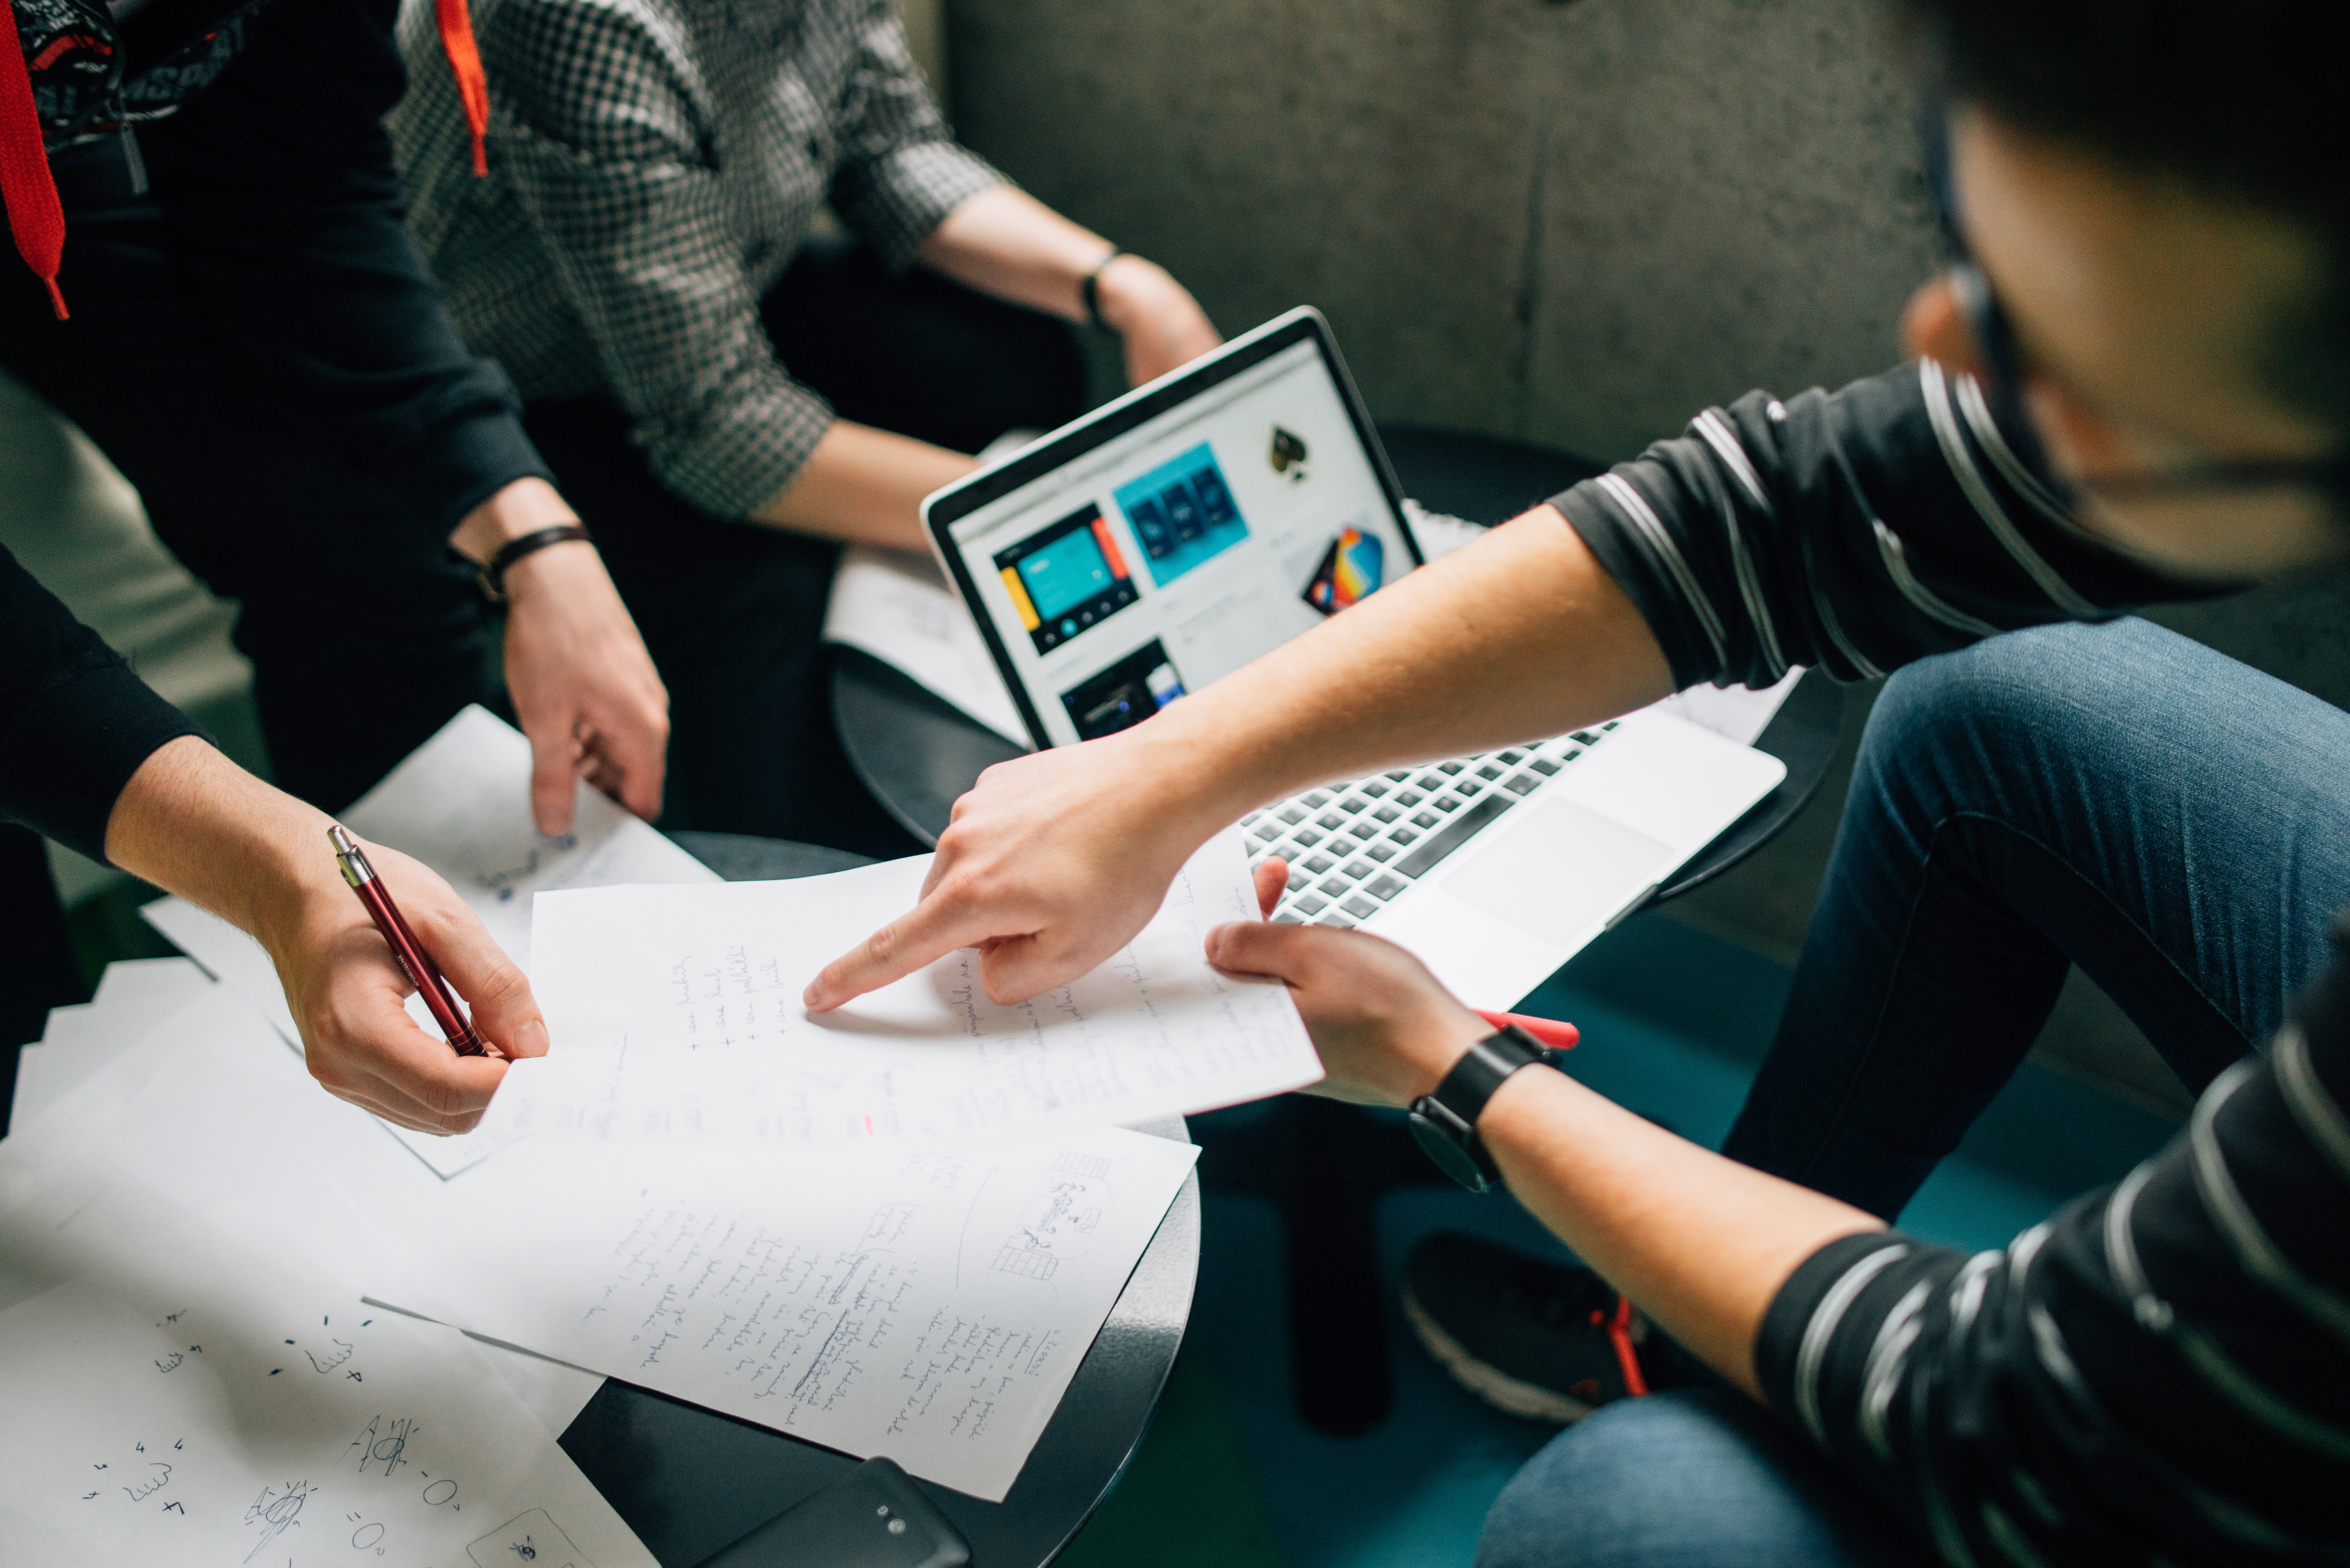 Comment manager les personnalités difficiles ? - Personnes retardataires anxieuses négatives - Innovation Story